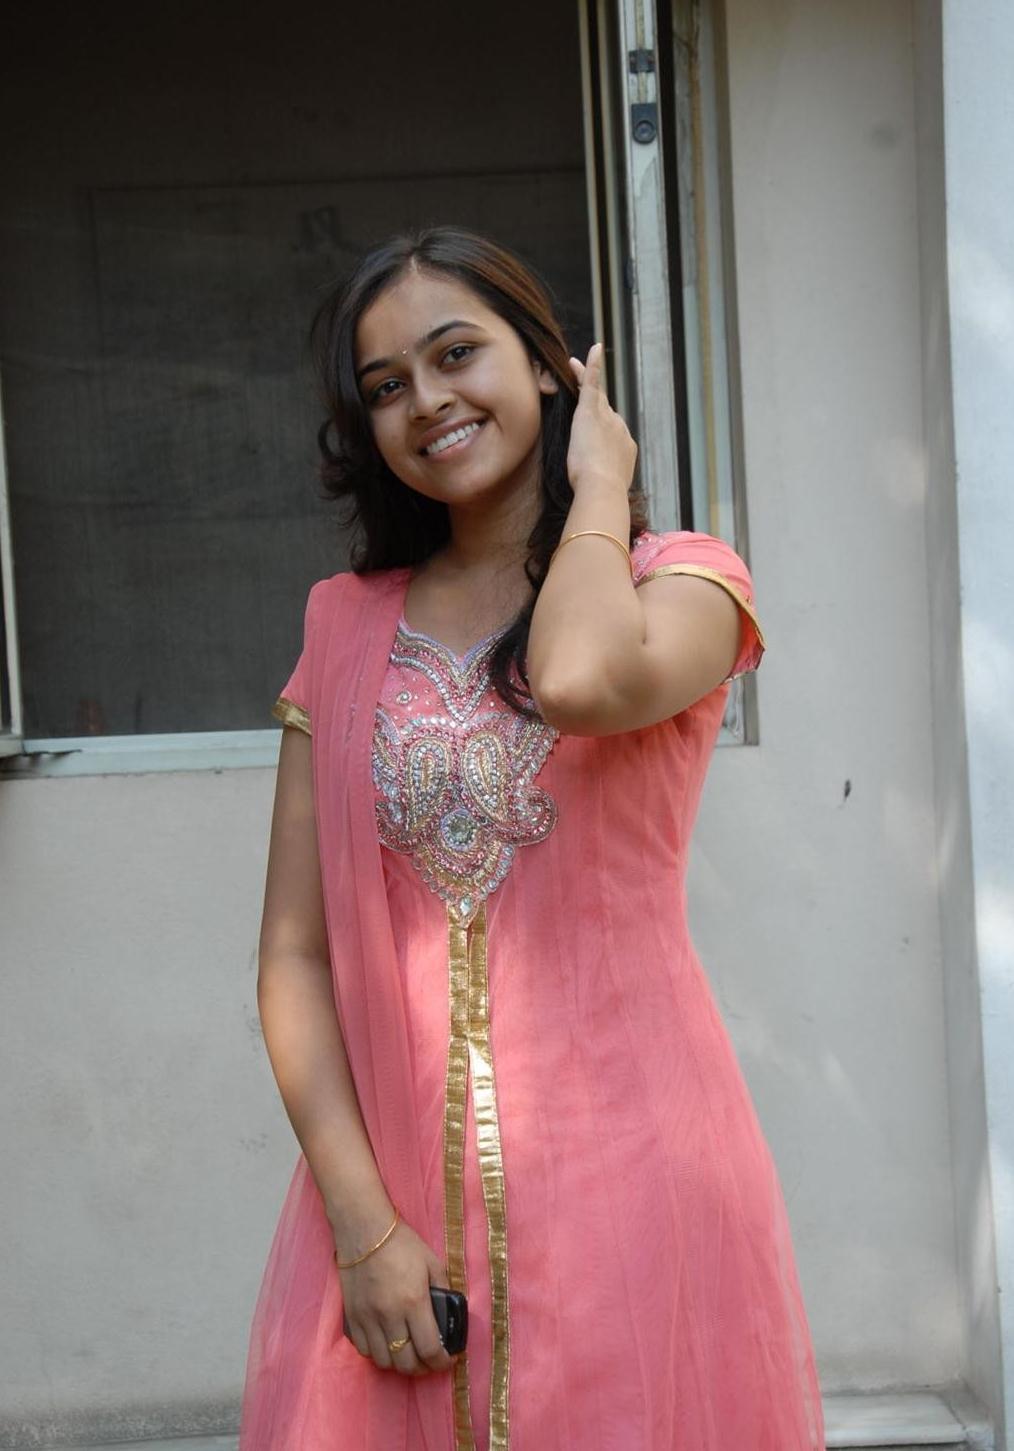 Sri Divya Bra Size, Age, Weight, Height ... - Celebrity Sizes